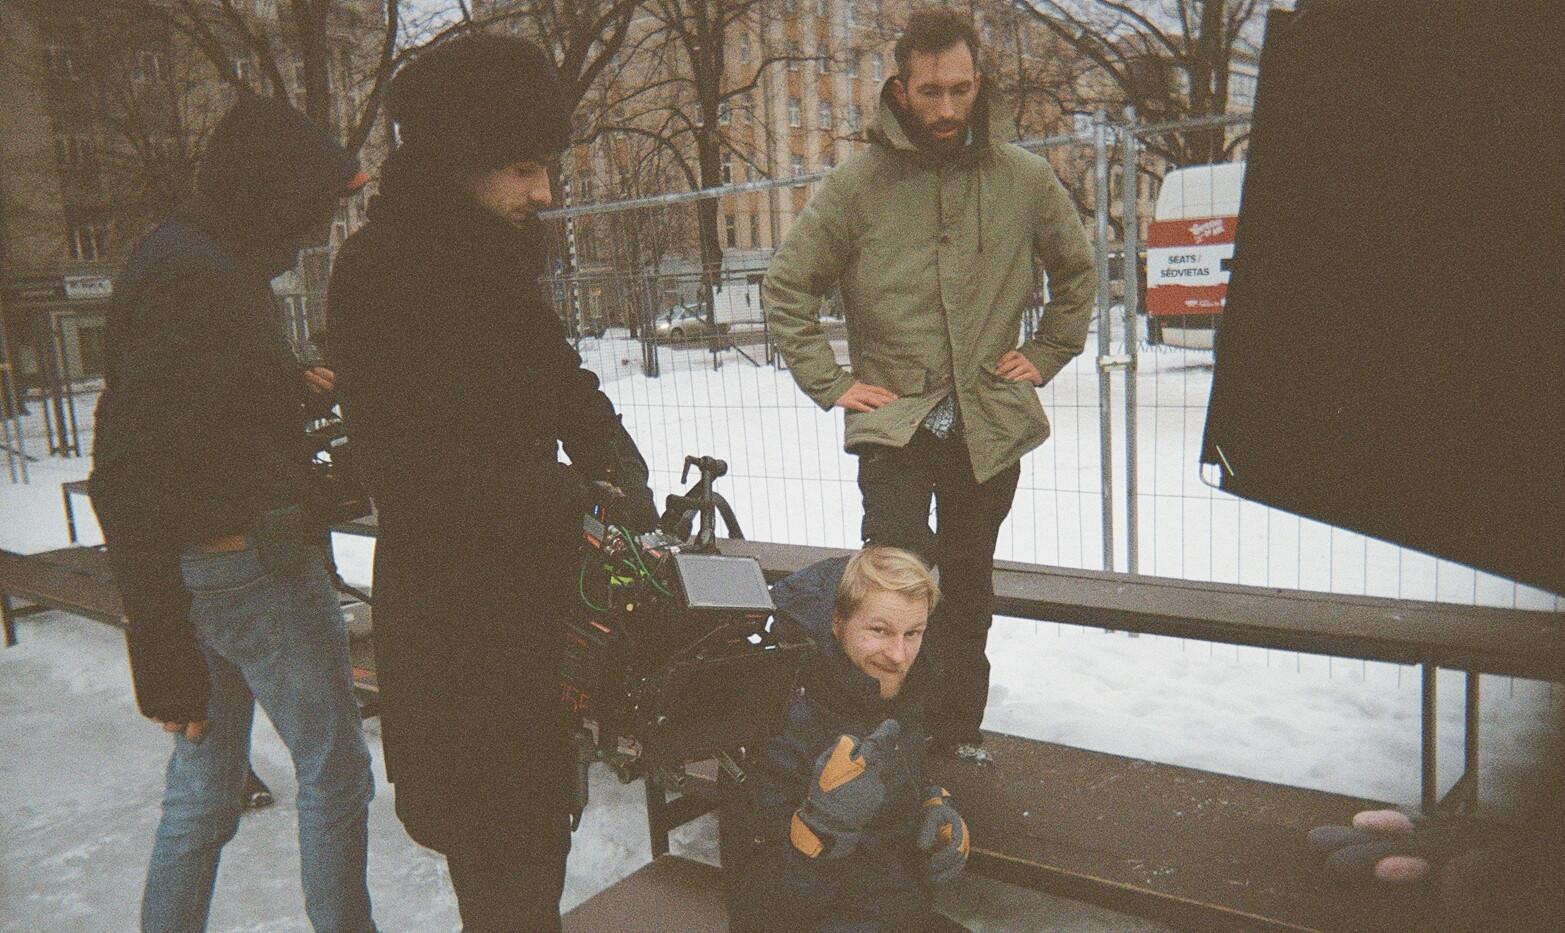 Preparing to shoot the ice skating scene.